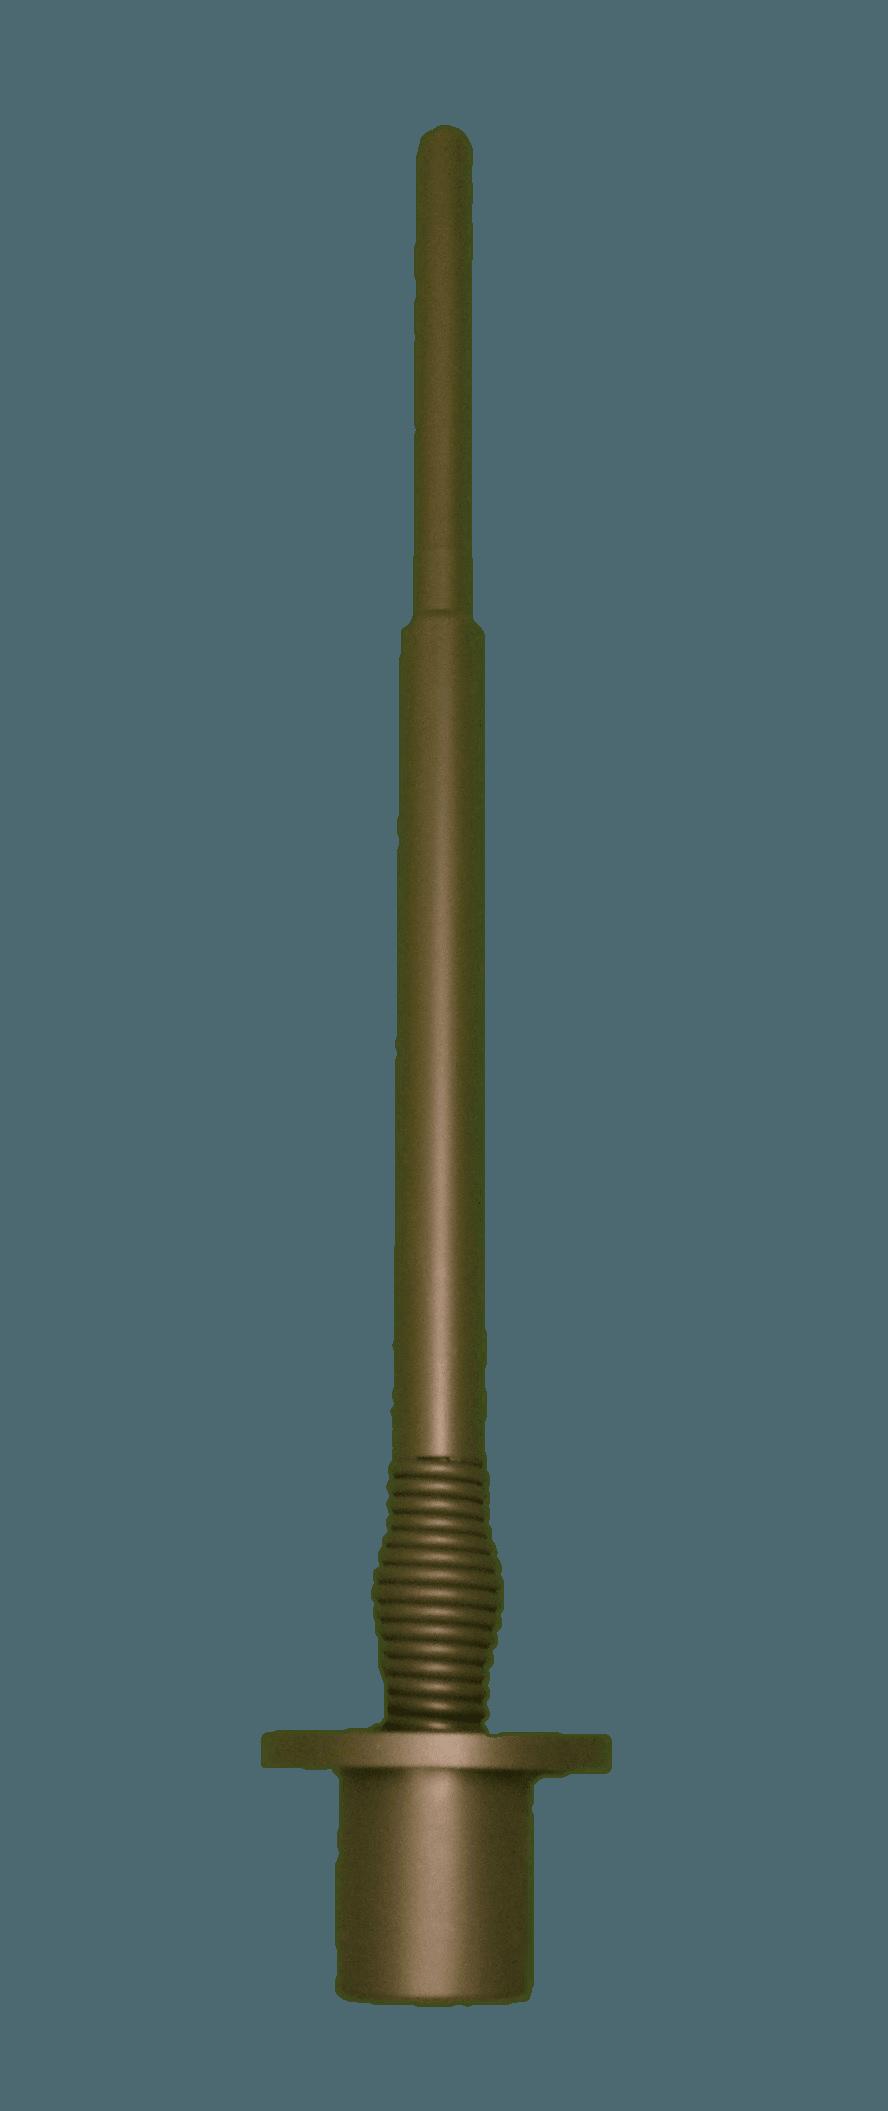 4400-5000 MHz – MVDP4.4-5.0-9-D